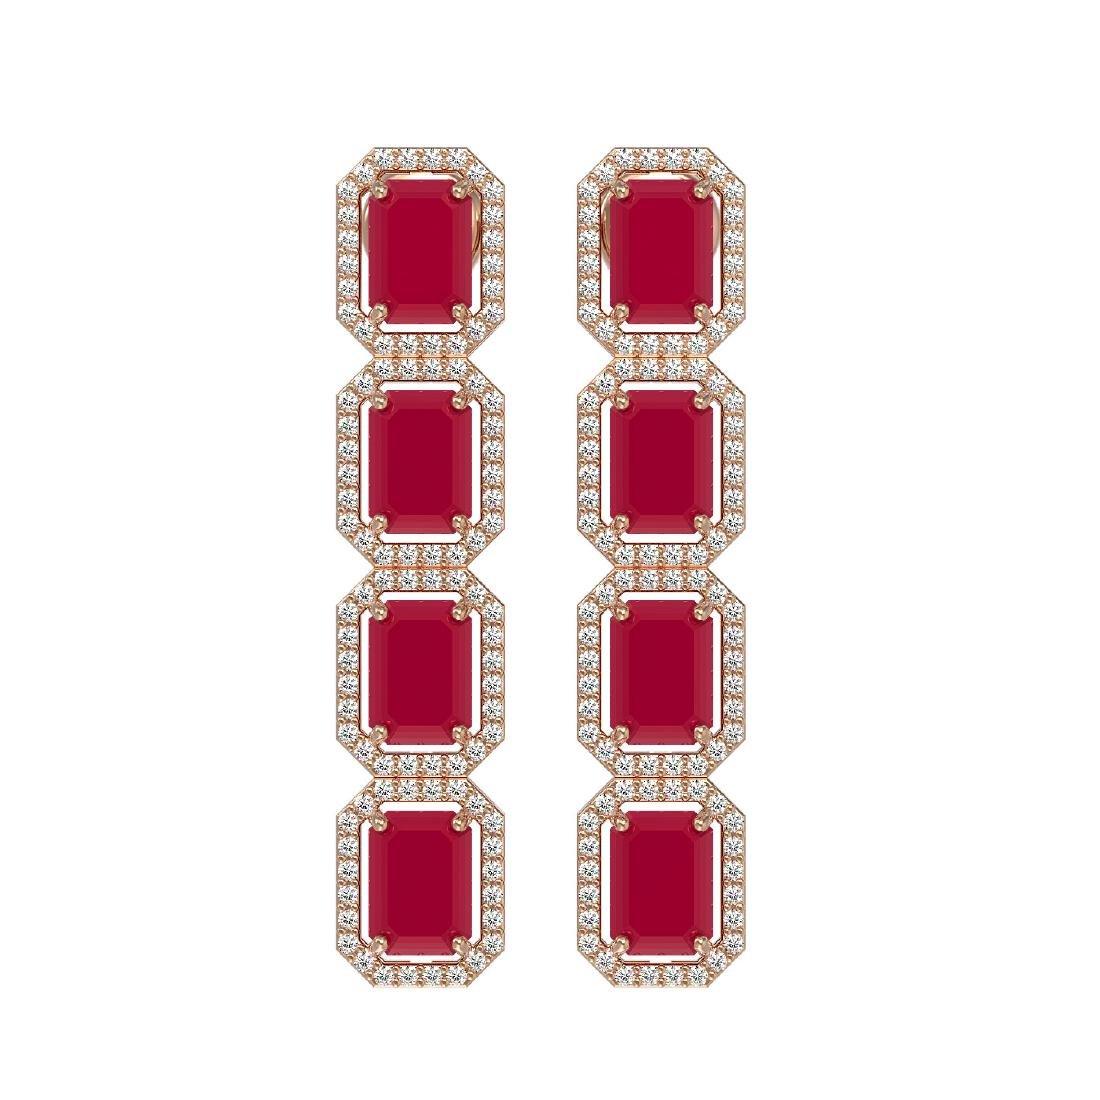 12.33 CTW Ruby & Diamond Halo Earrings 10K Rose Gold